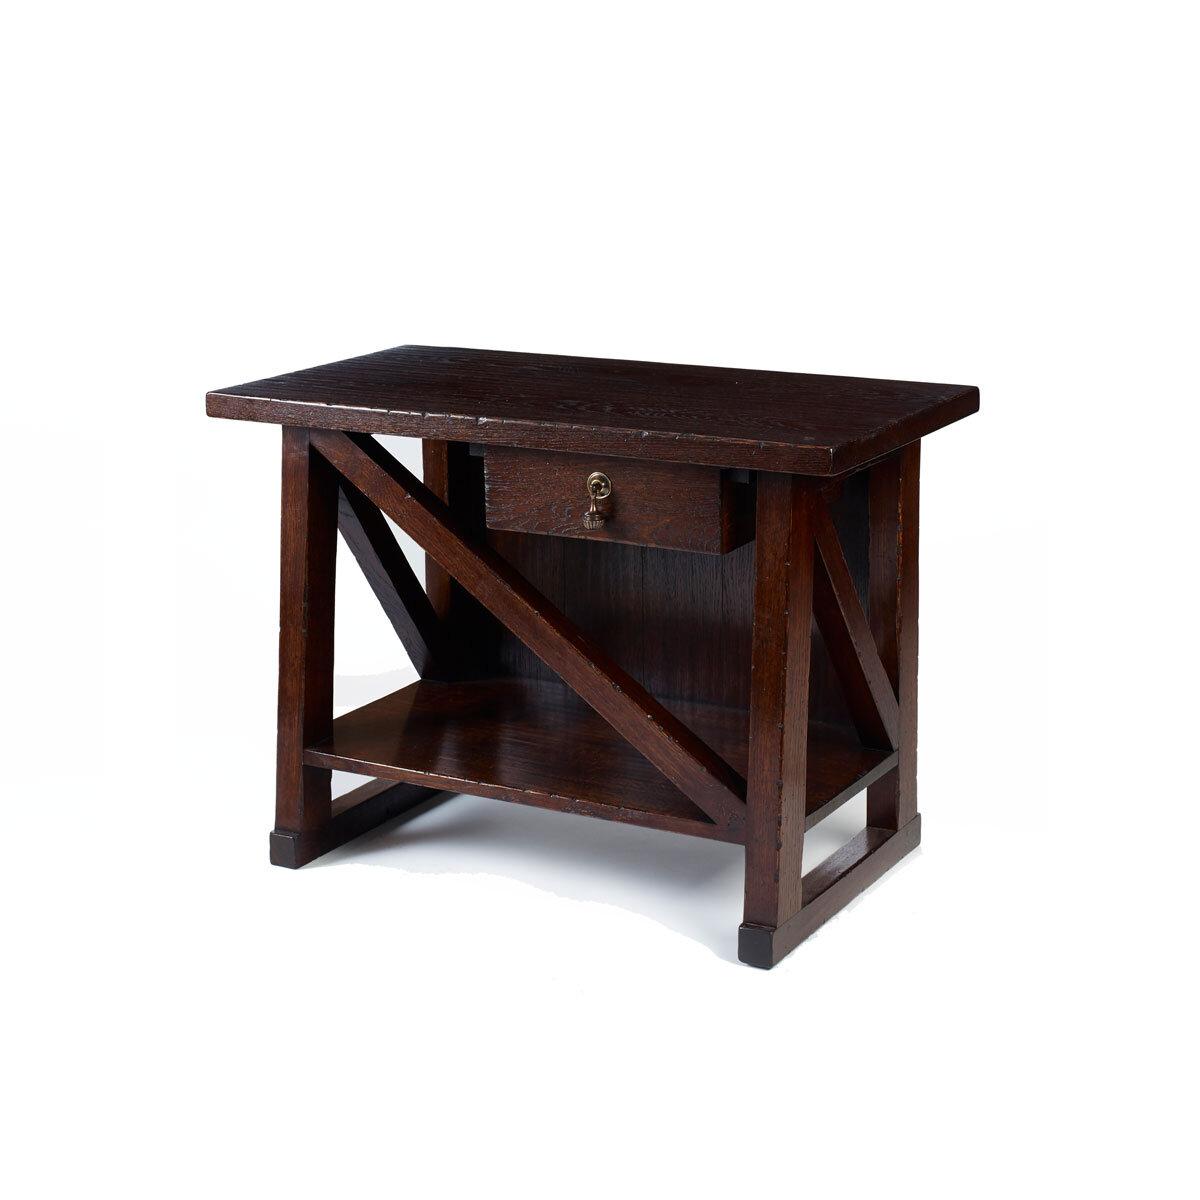 PR.32561-Axel-Side-Table_forweb.jpg